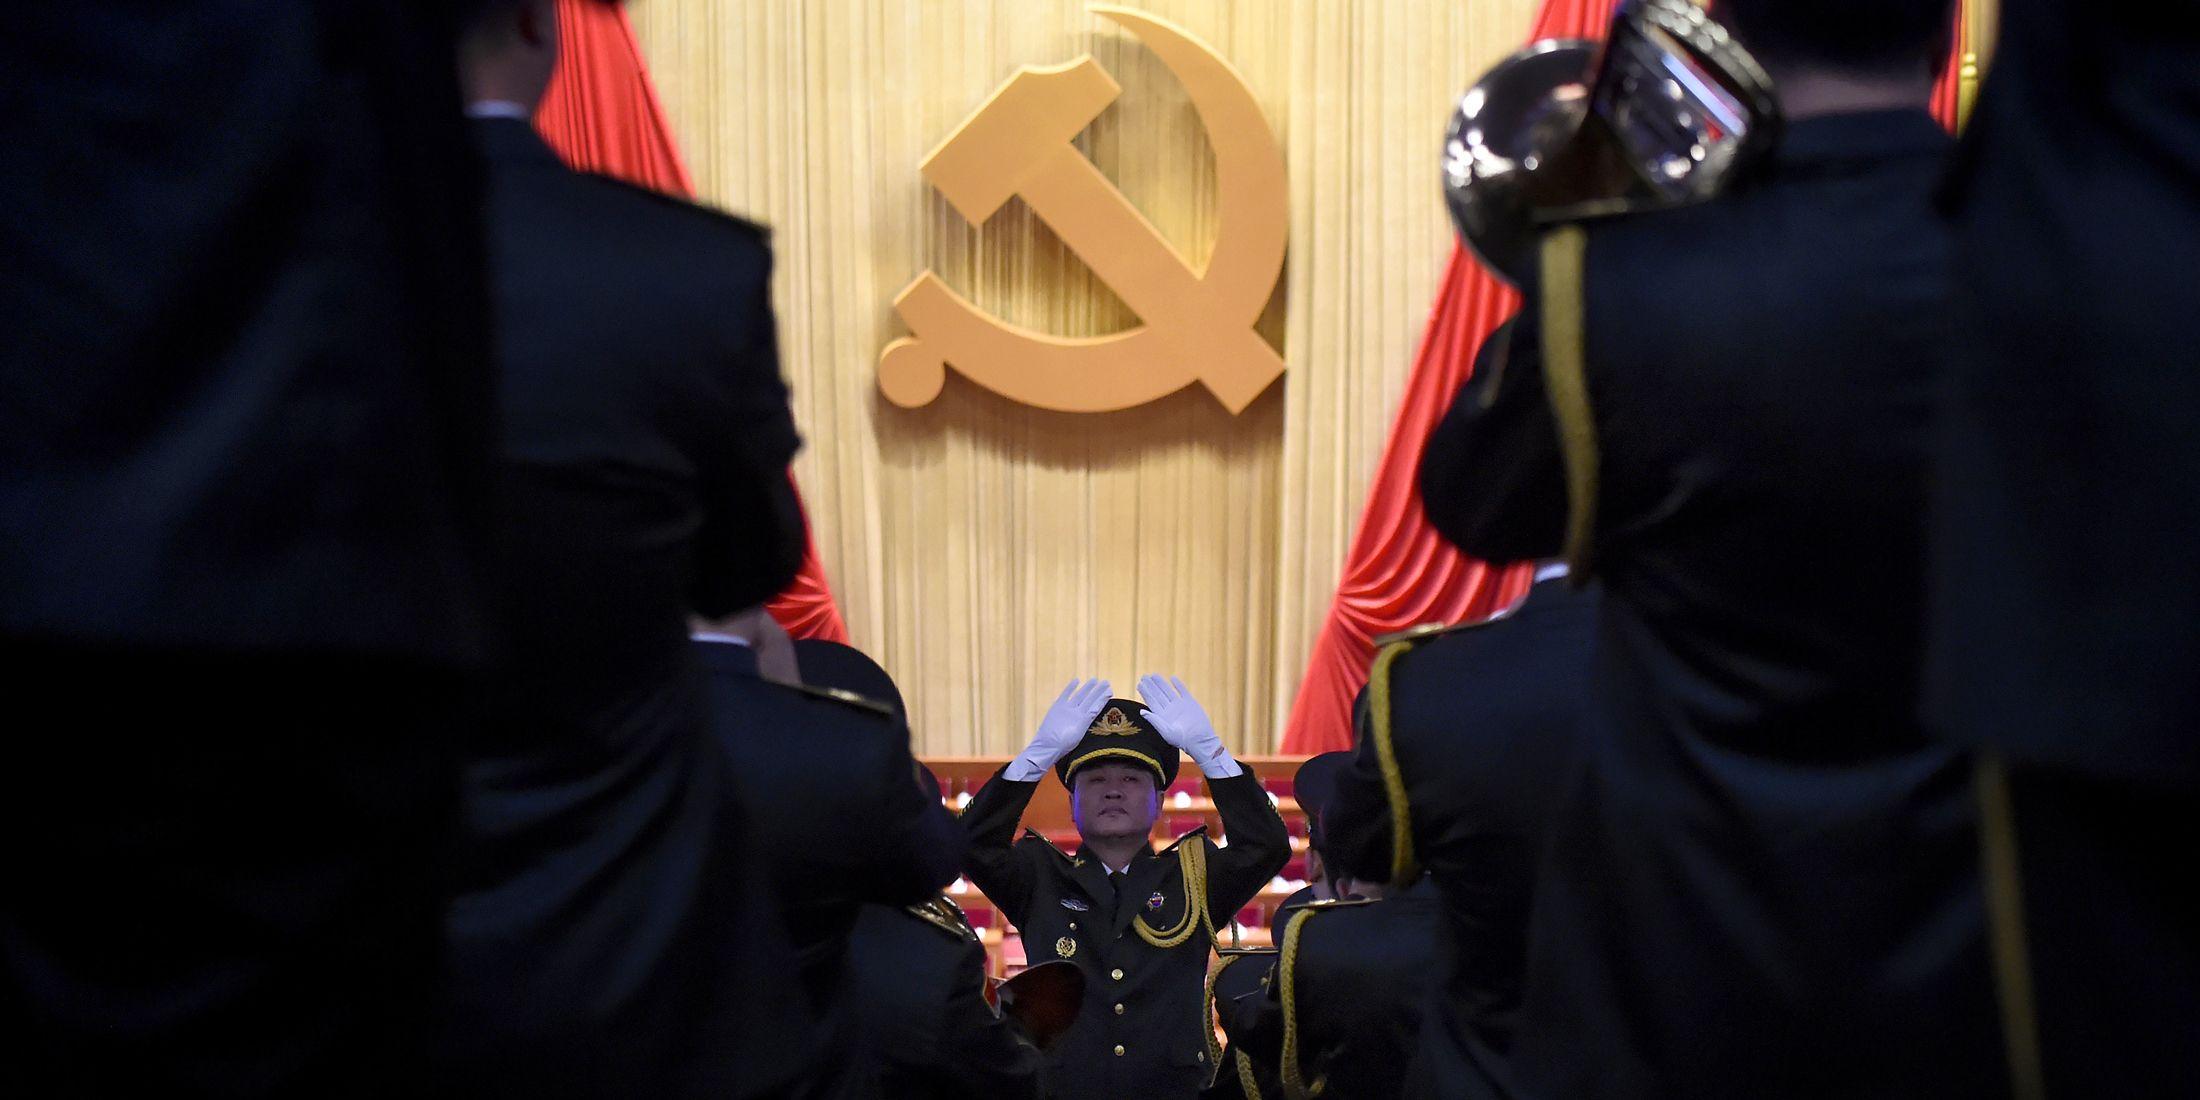 Rare Chinese Bureaucratic Shakeup Reveals Future Leaders